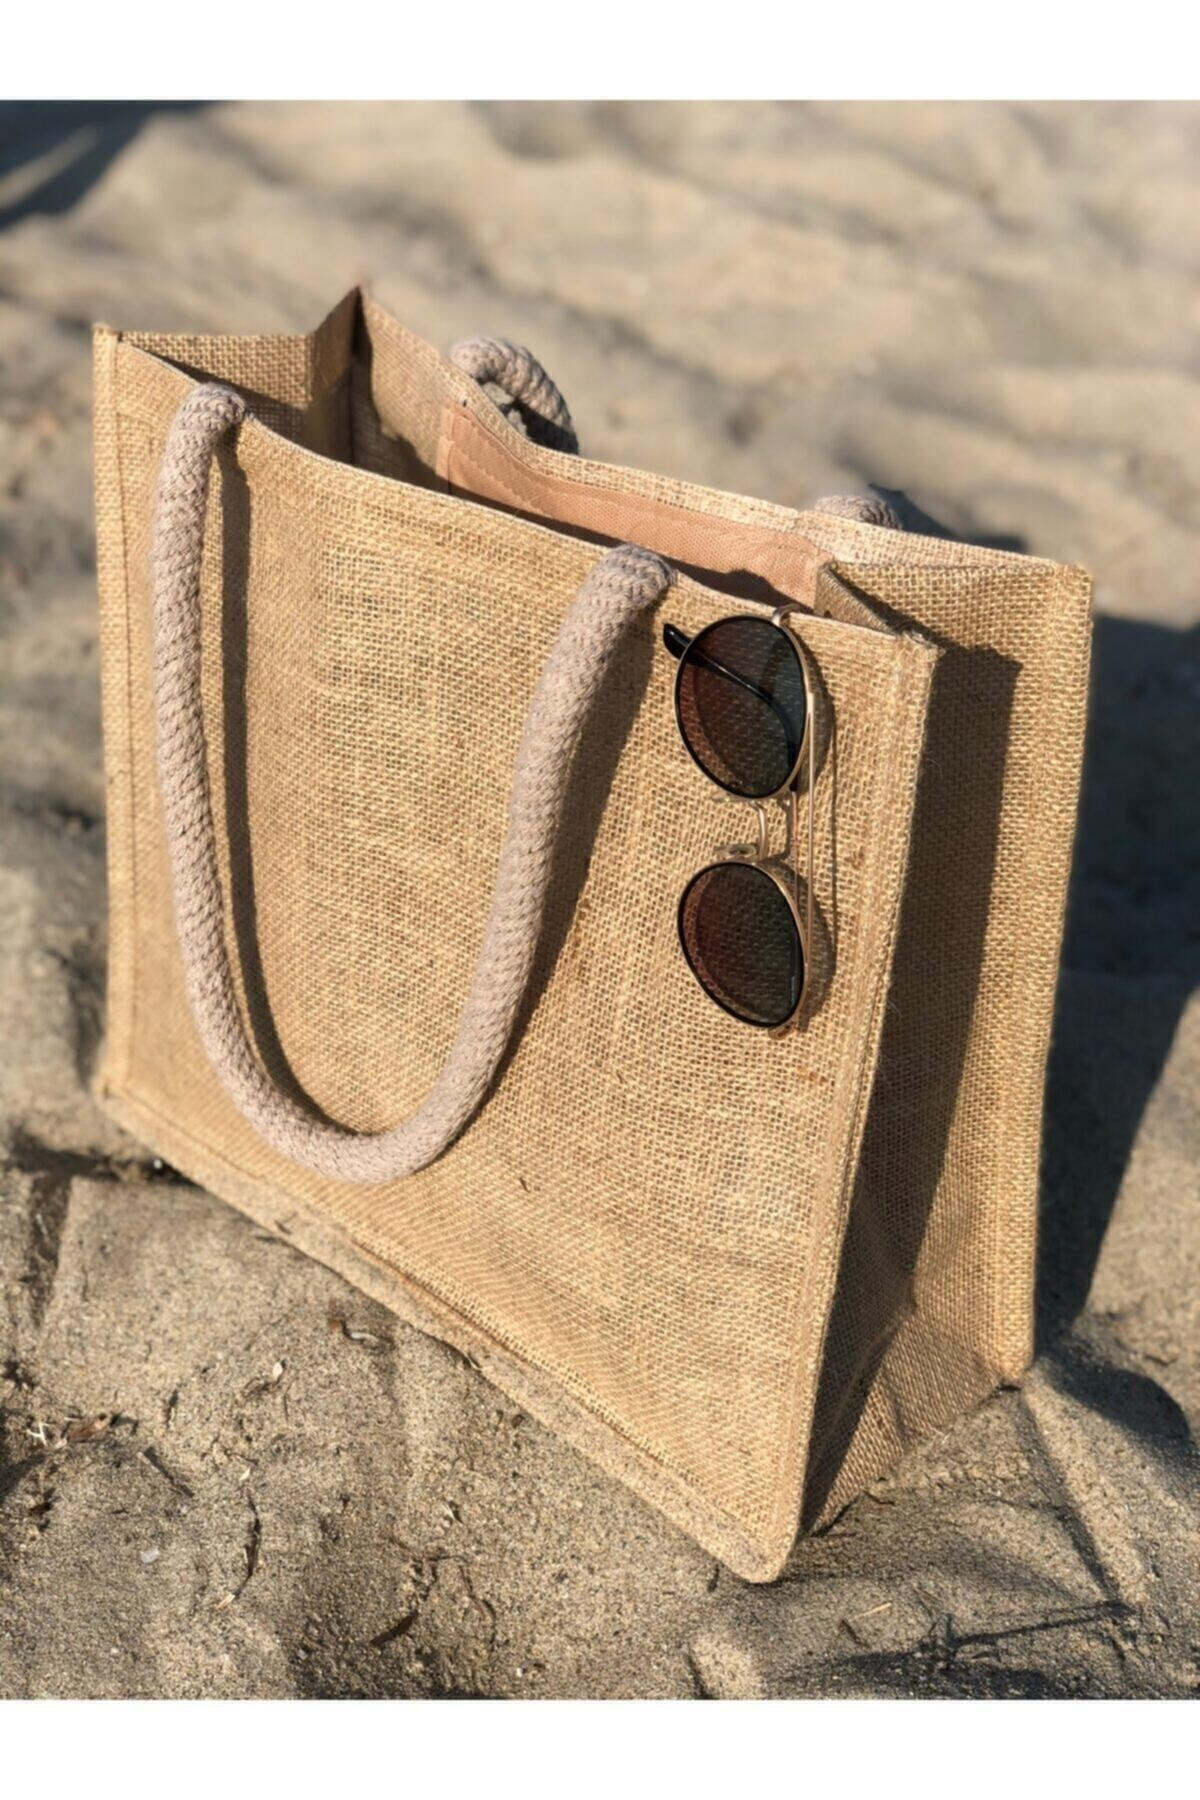 Women's Brown Wicker Round Rope Strap Beach Bag/ Muslim clothing / Islam / Muslim fashion Turkey / h